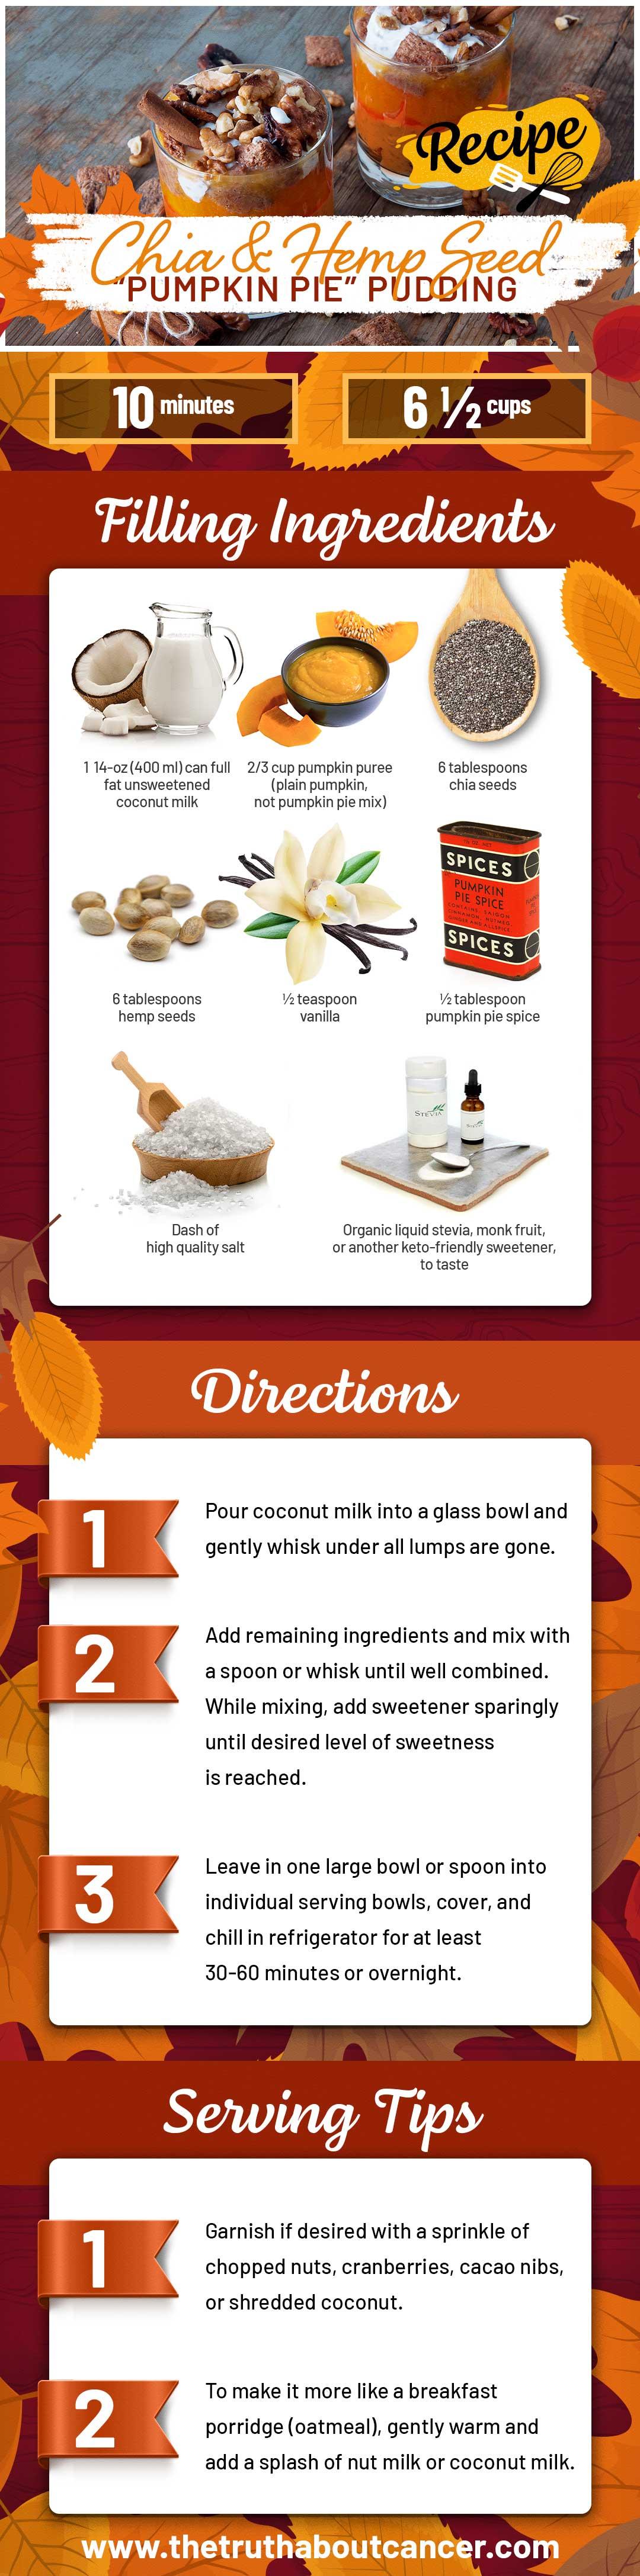 chia hempseed pumpkin pudding recipe